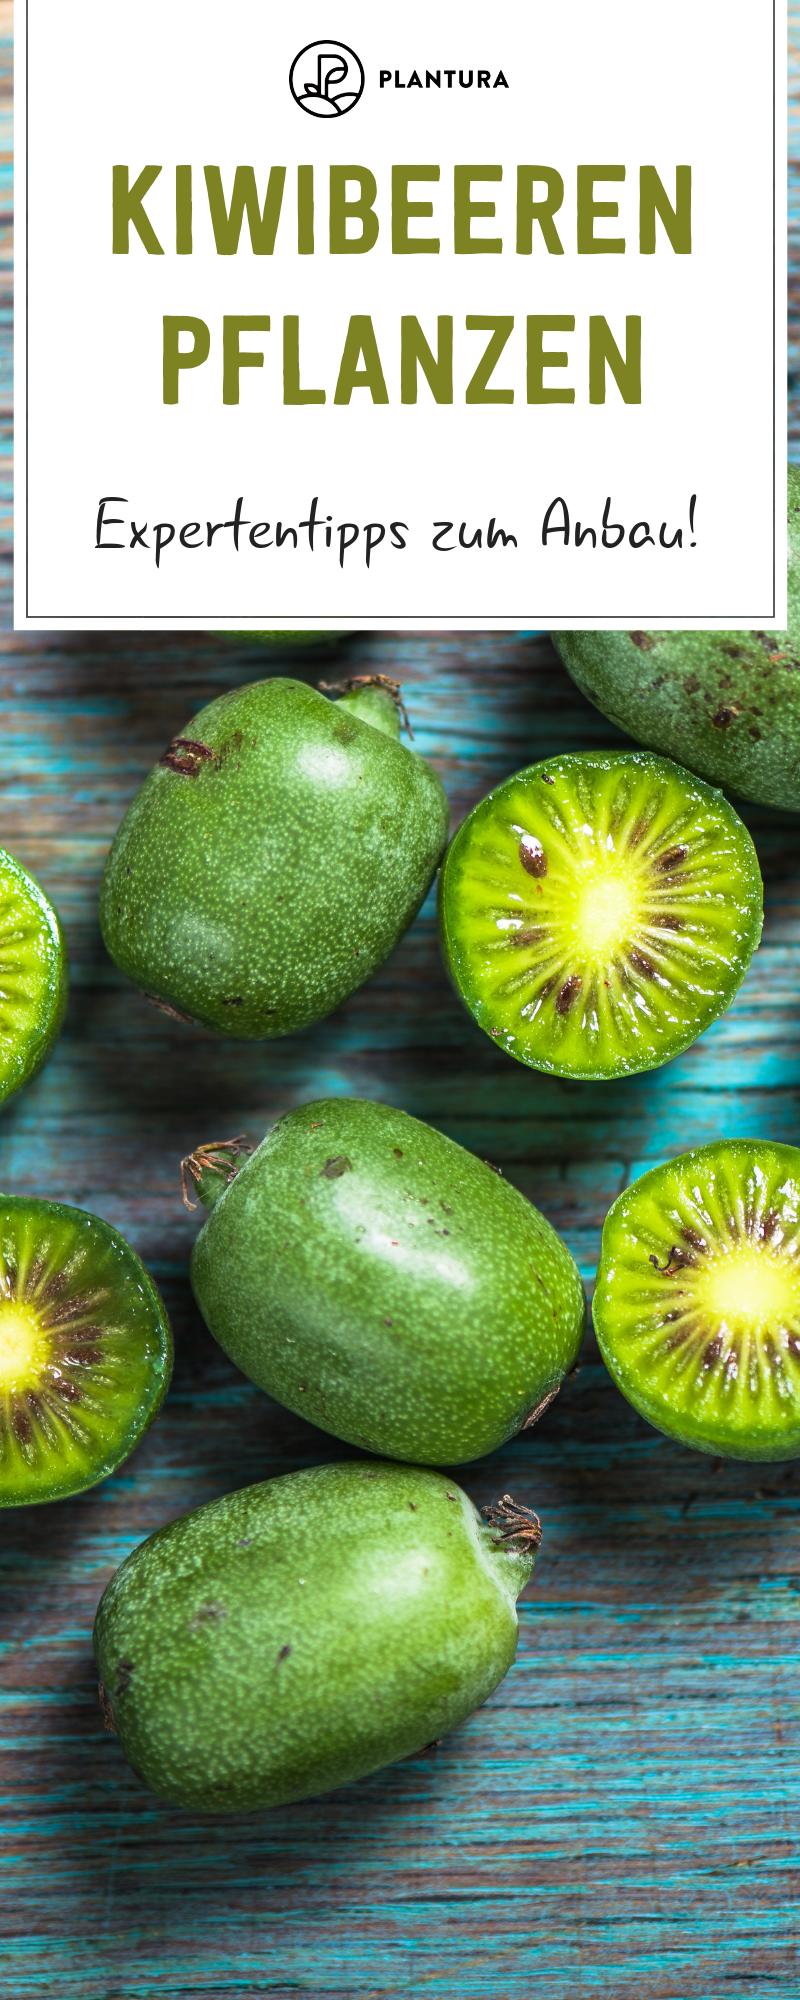 Photo of Planting kiwi berries: tips for growing mini kiwi